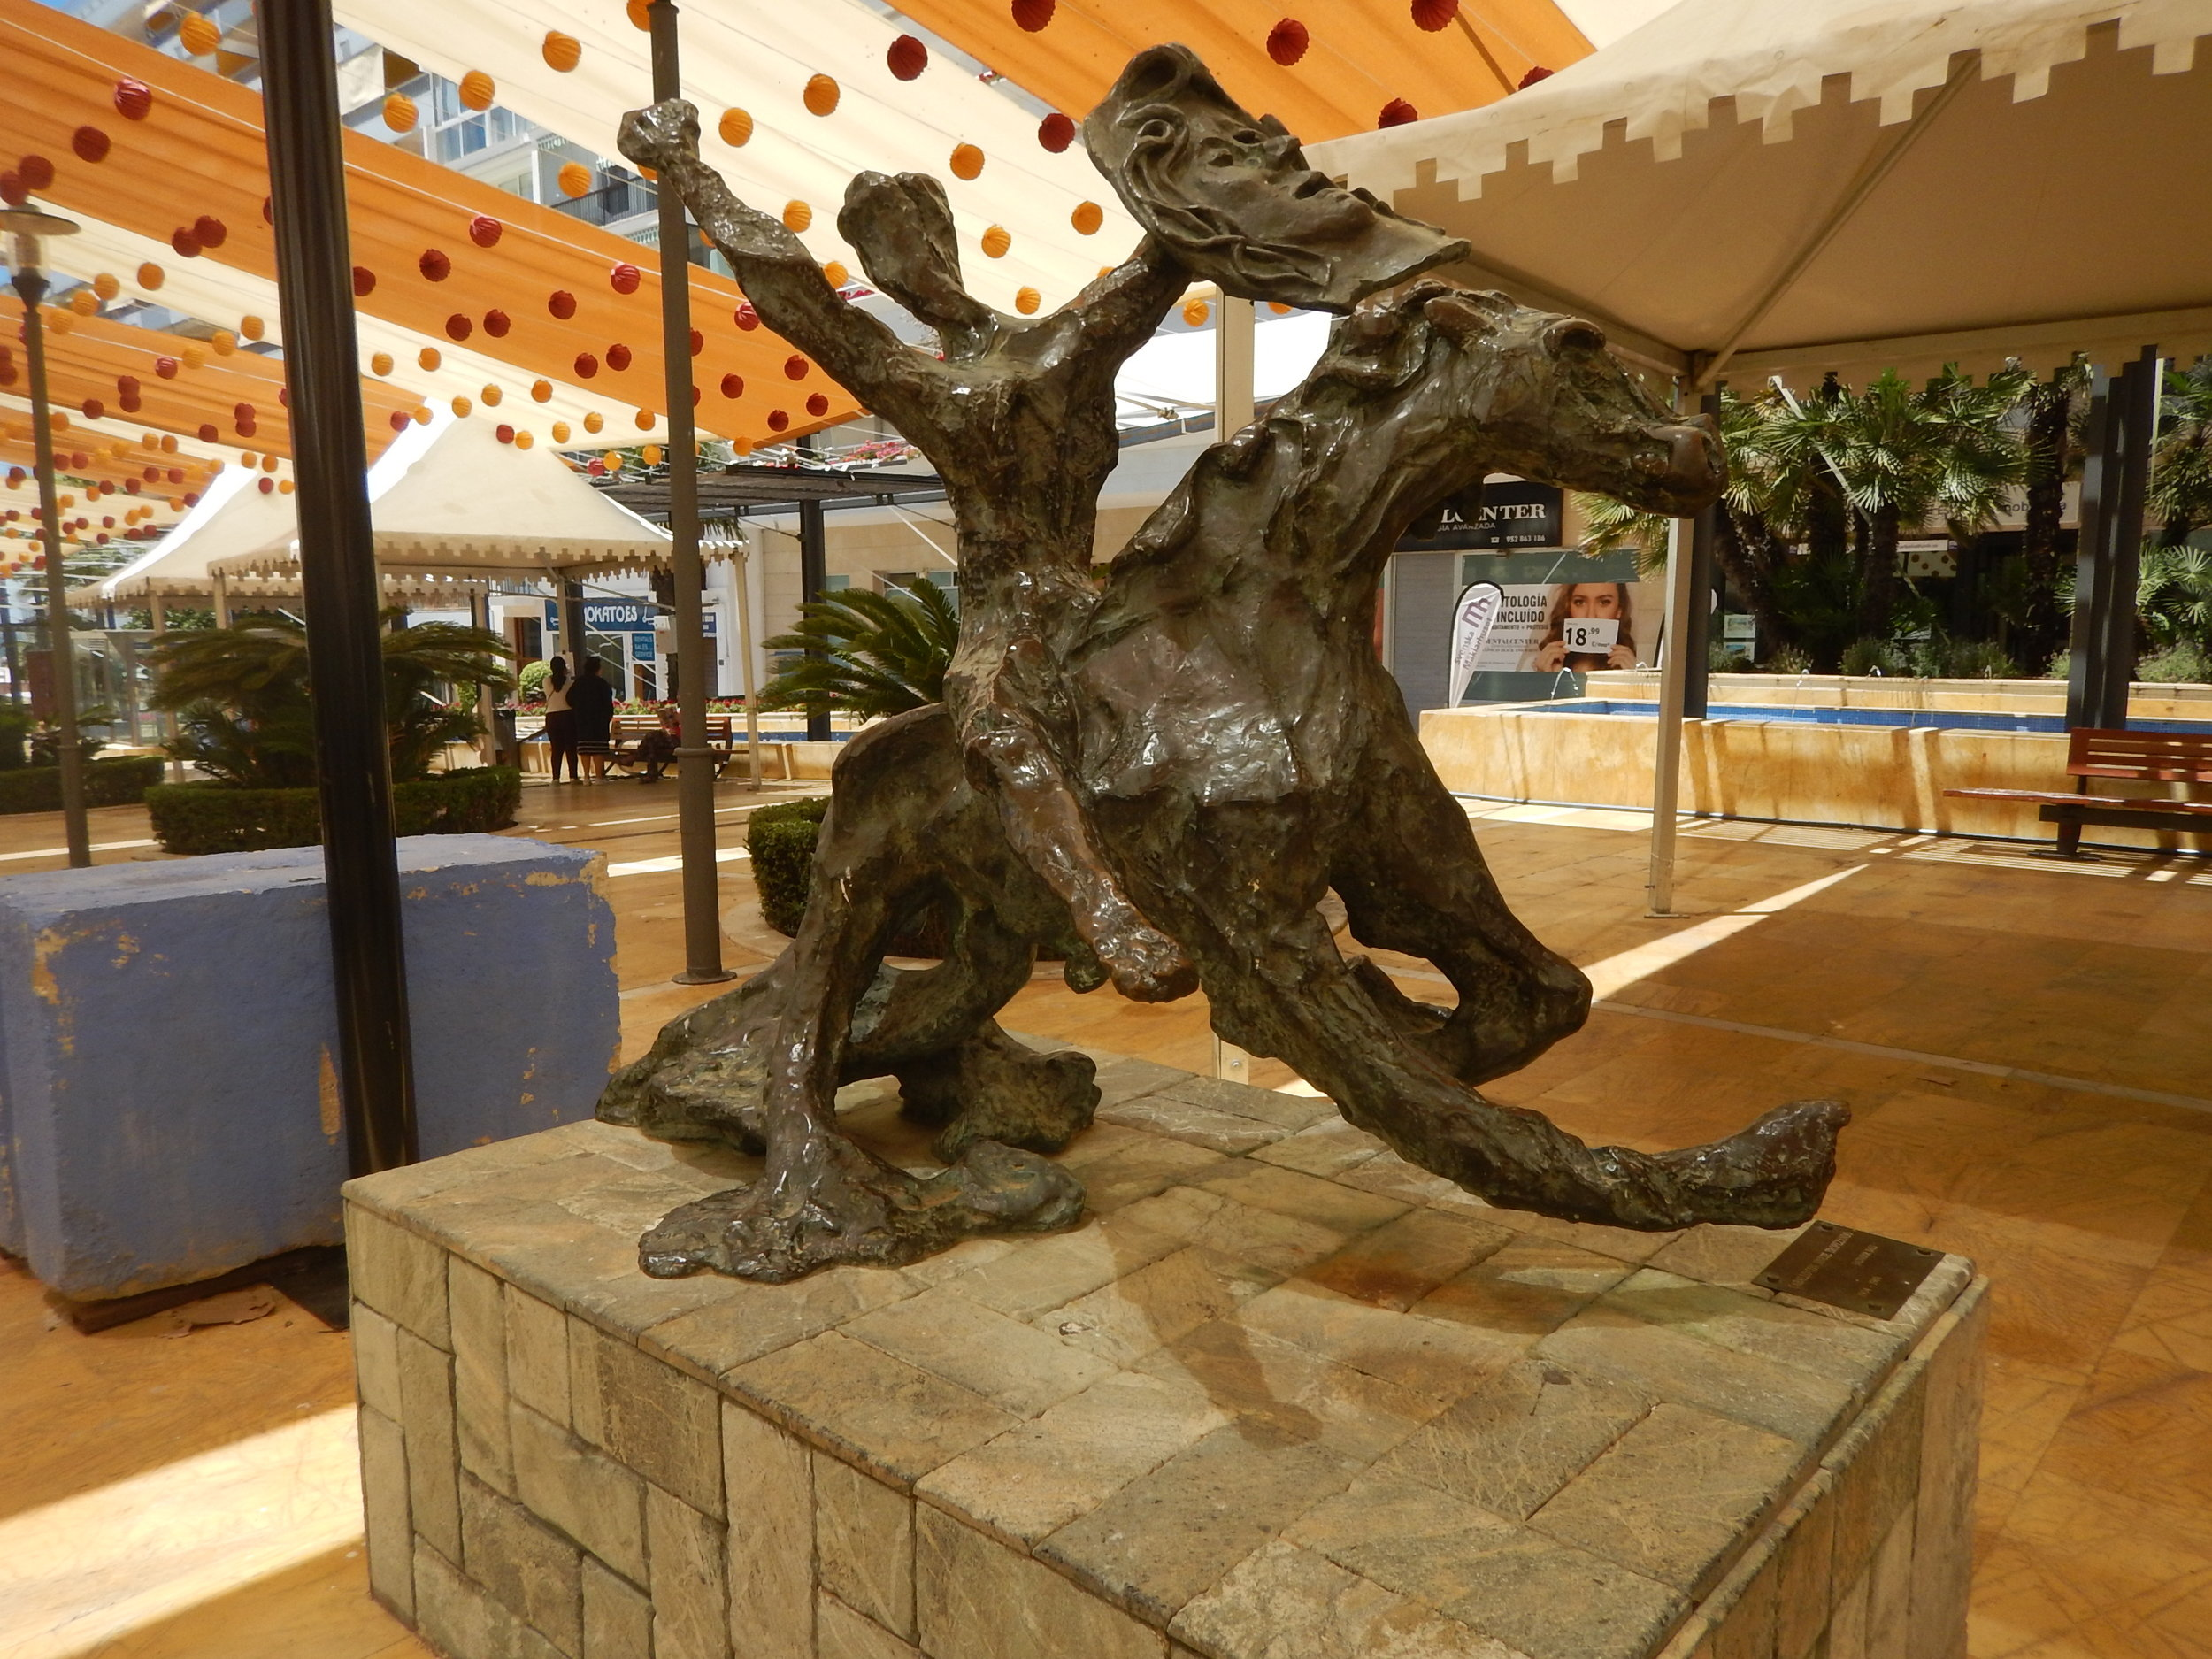 clutching at straws here!! Salvadore Dali's impression of Zorro on horseback, in Marbella, Spain.